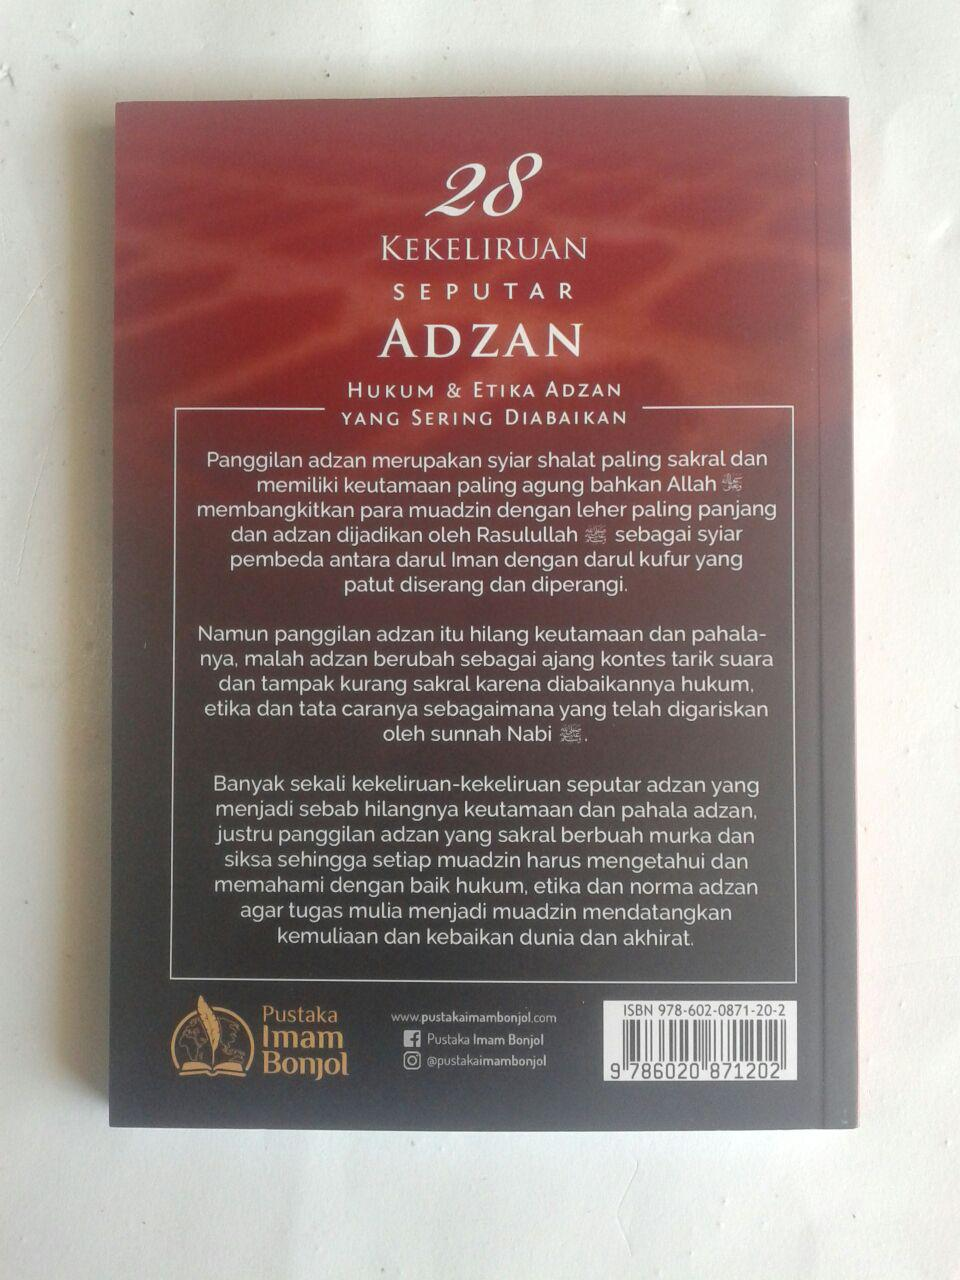 Buku 28 Kekeliruan Seputar Adzan Hukum Dan Etika Adzan cover